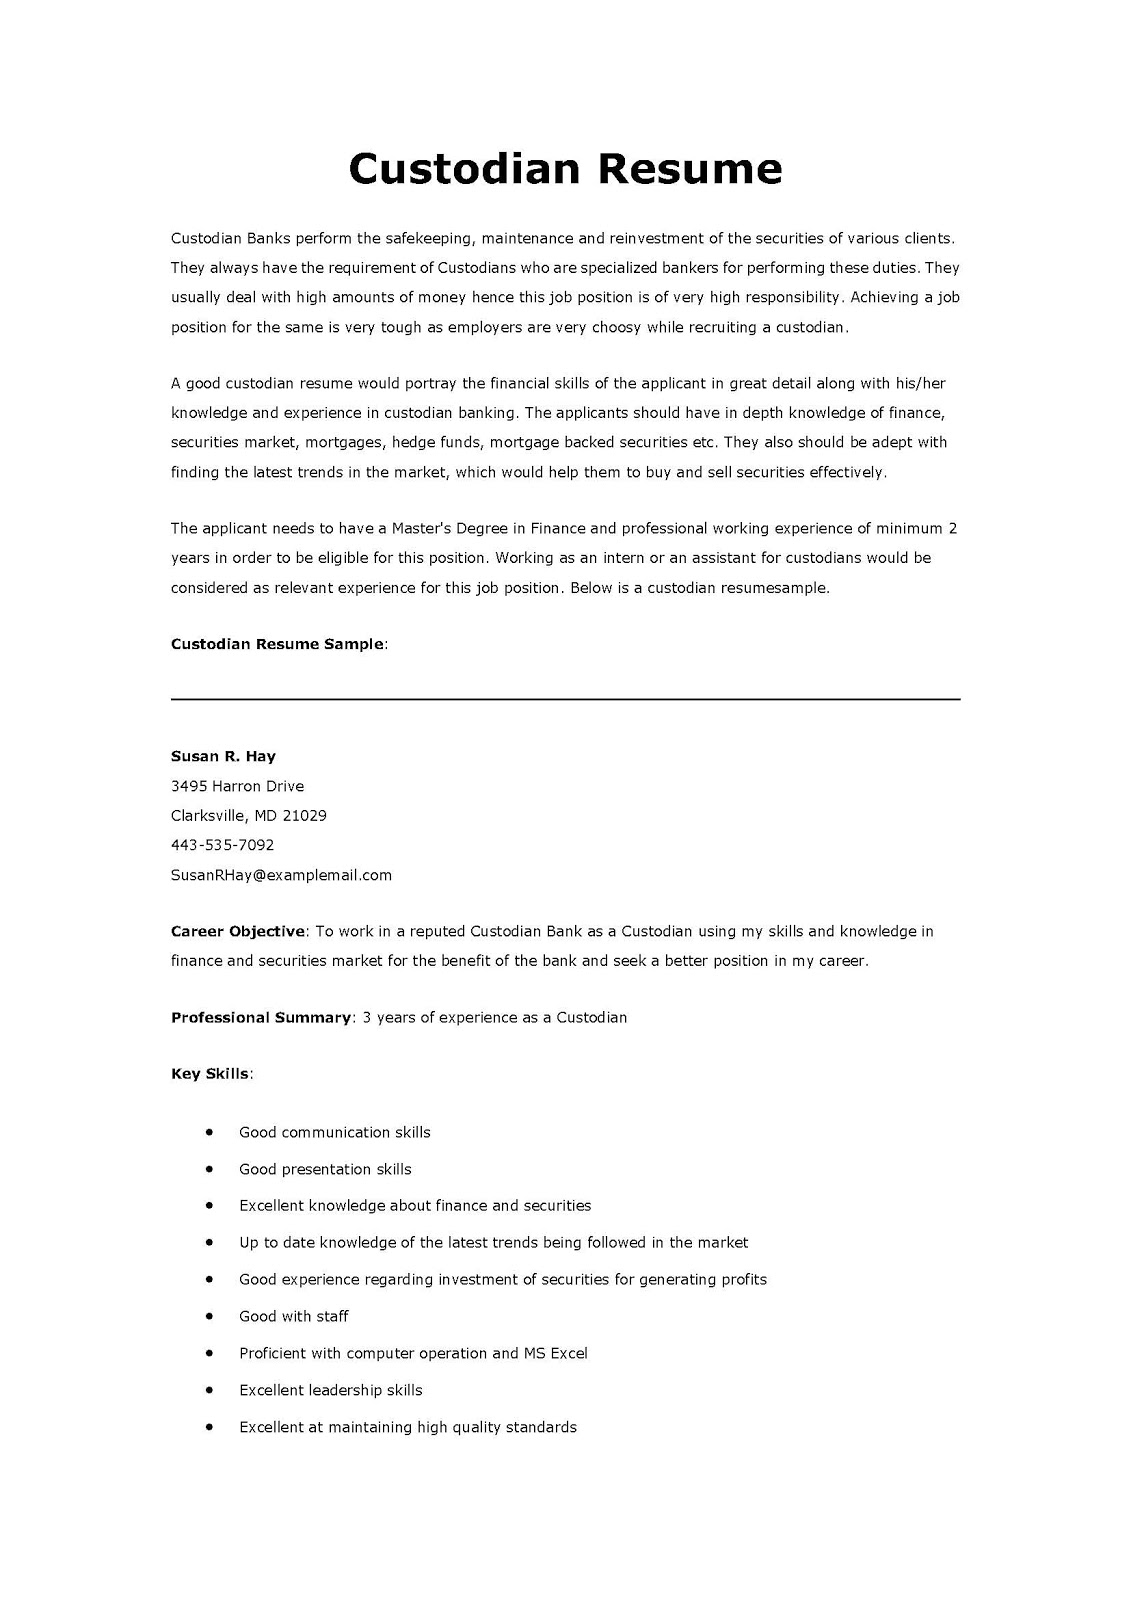 Attractive Les Precieuses Ridicules Petit Resume A Good Persuasive Essay On Custodian Resume